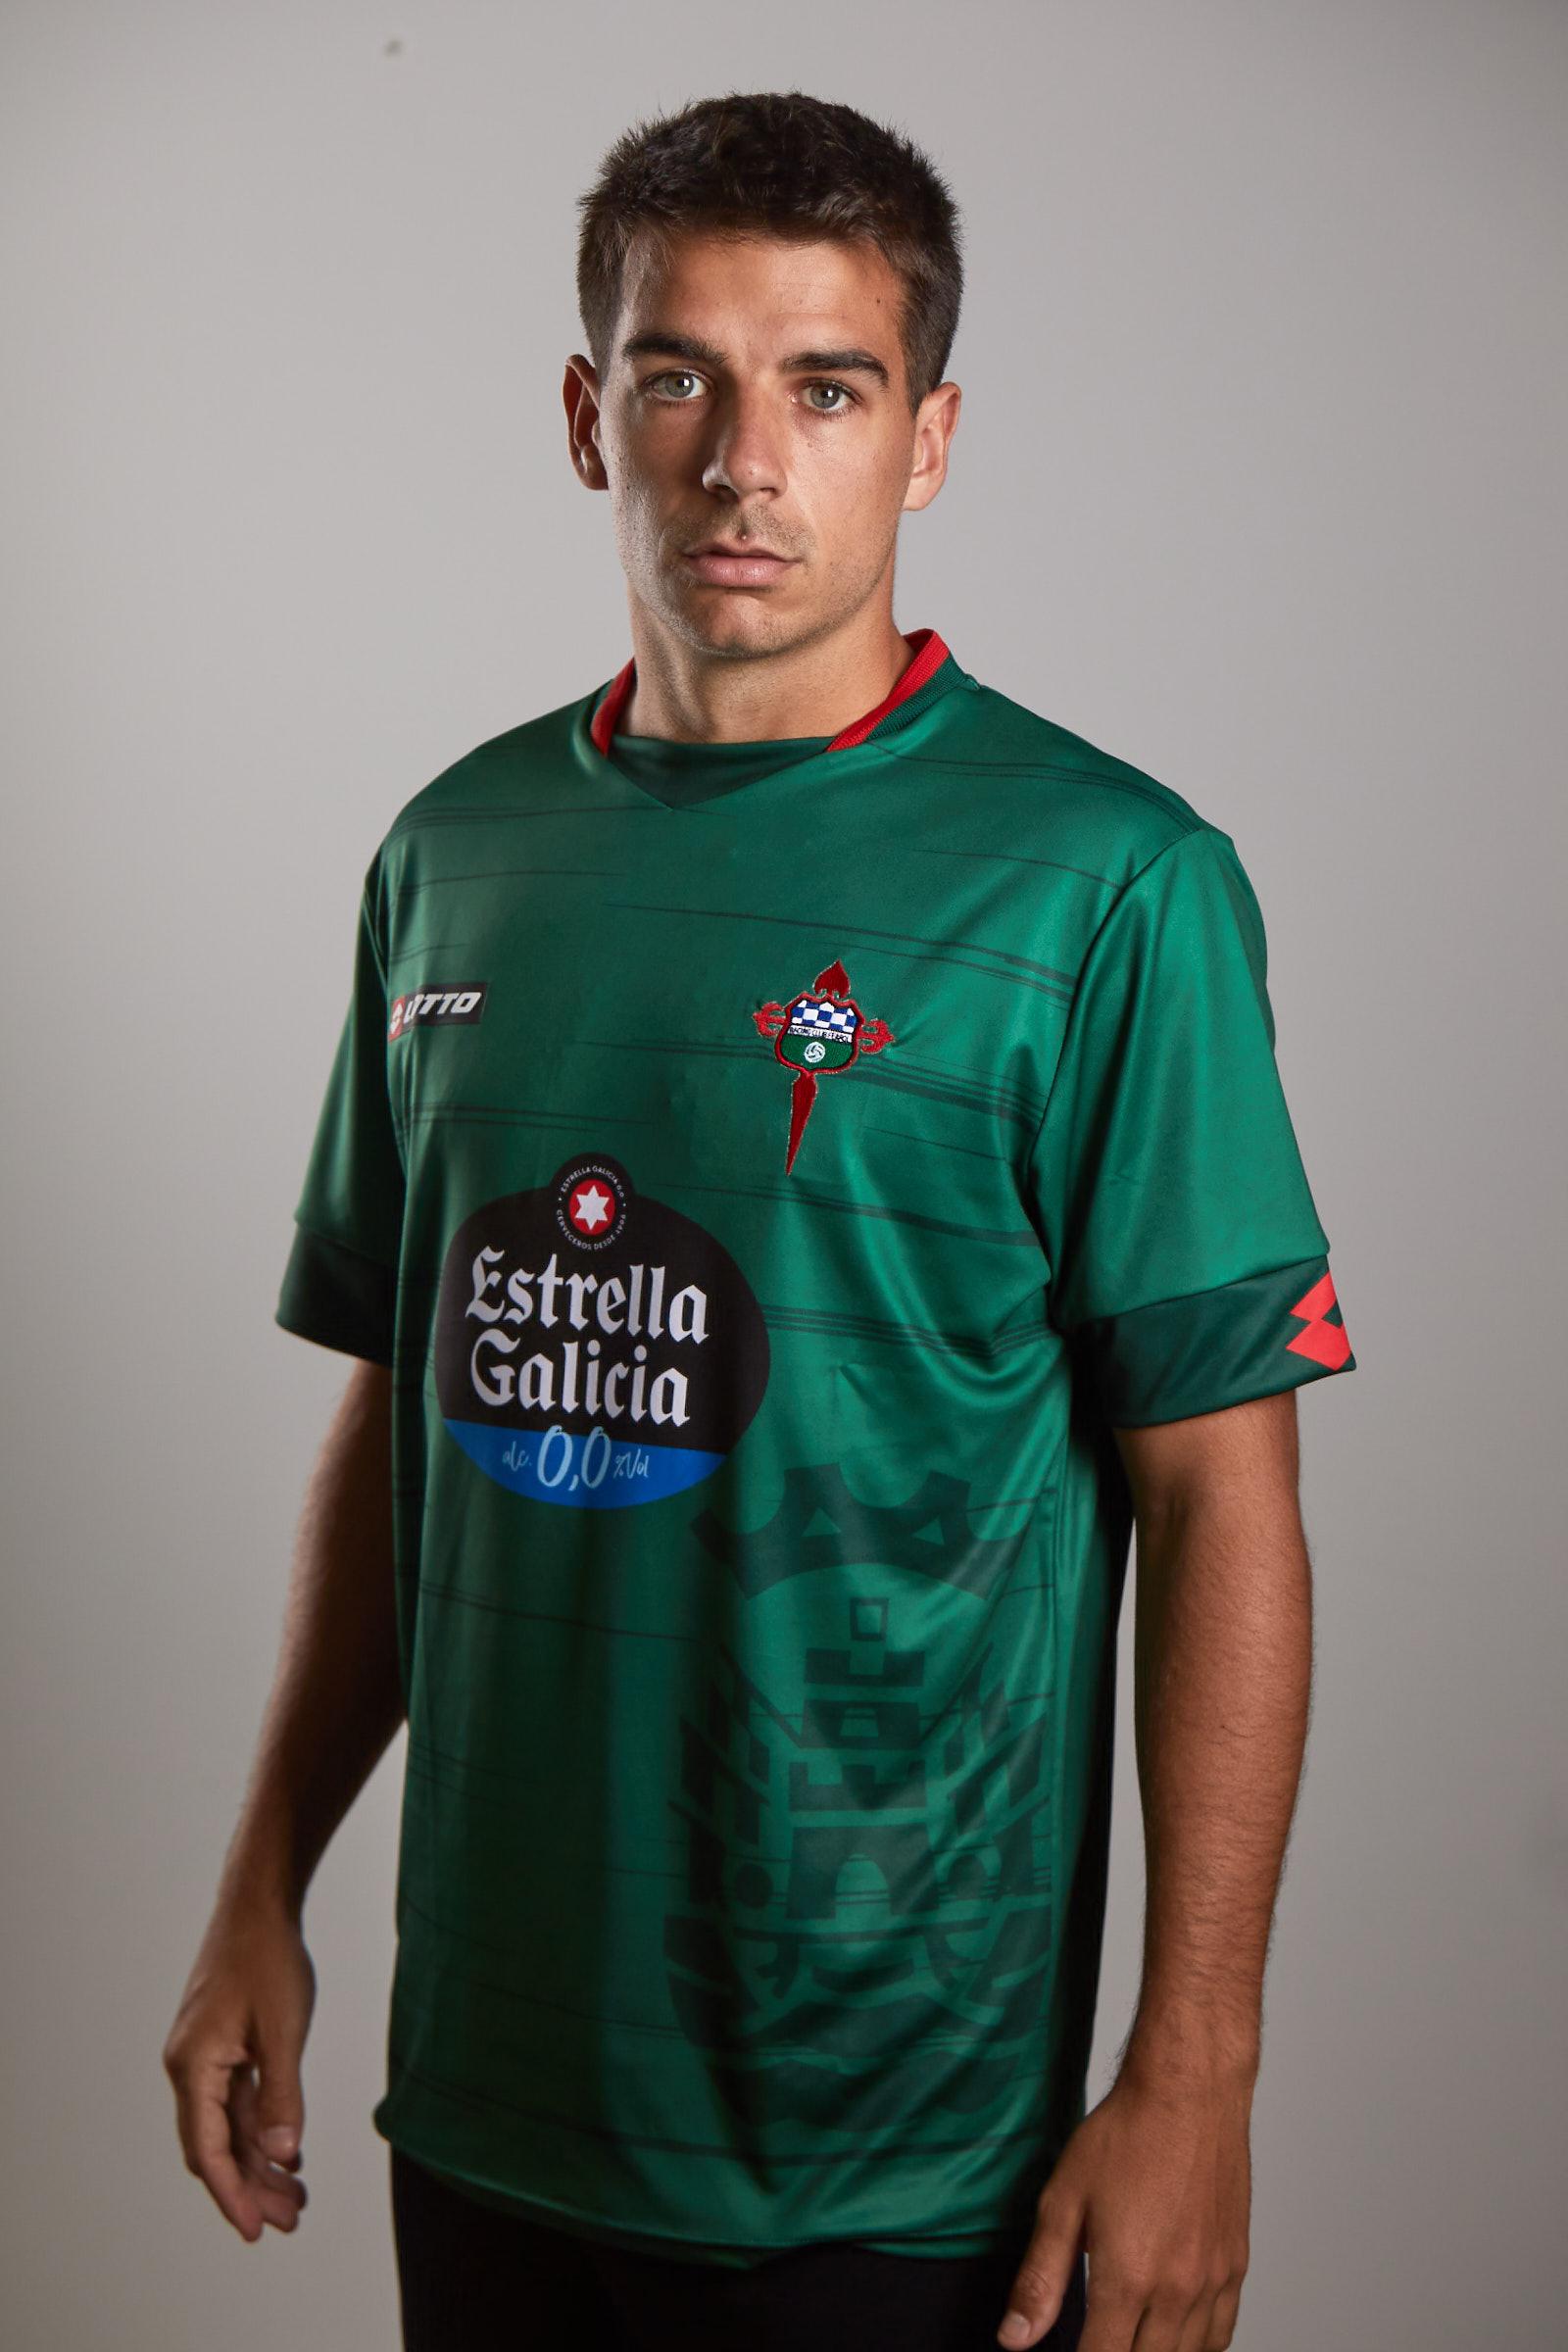 Juan Viacava